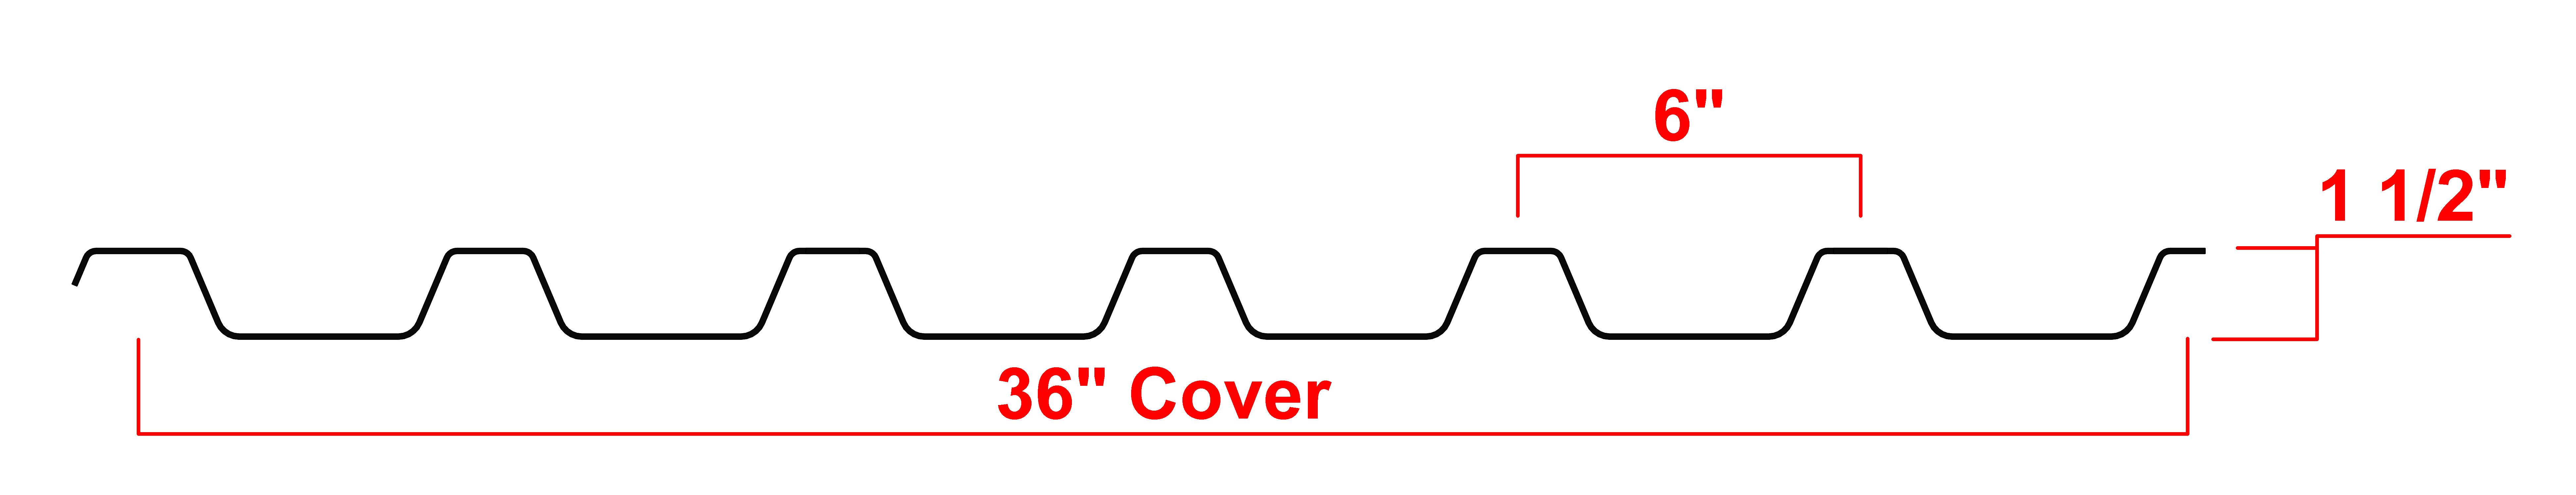 1.5 or 1.5C Steel Form Deck Profile